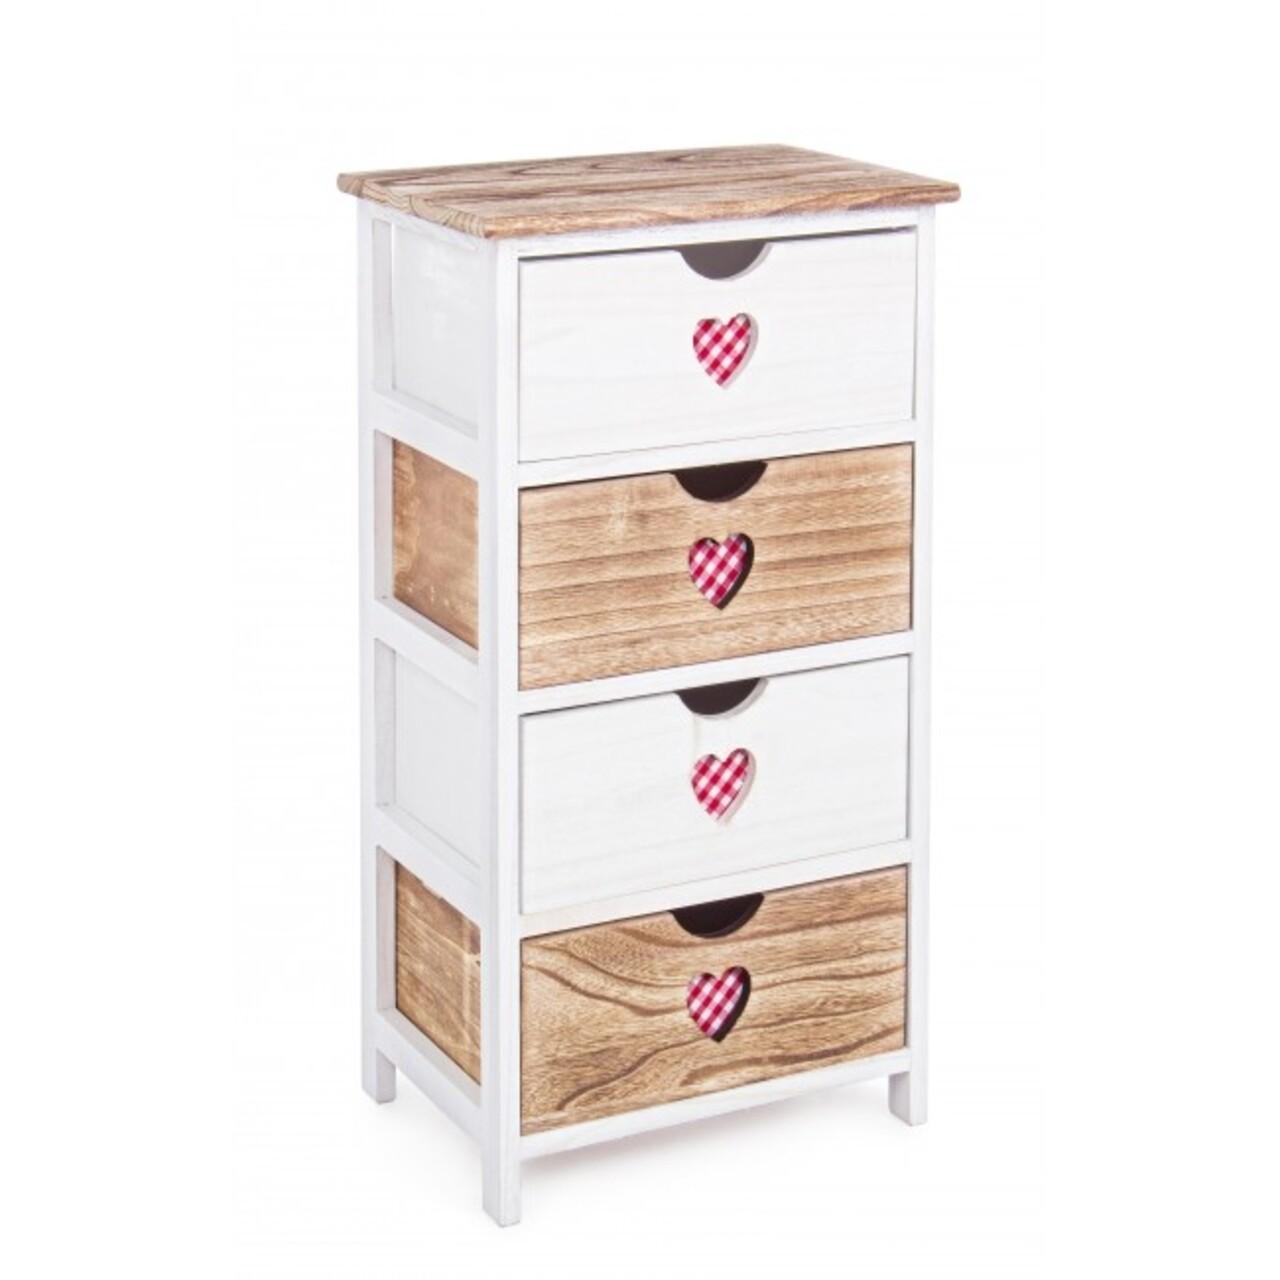 Comoda cu 4 sertare, Chalet, Bizzotto, 40x29x73 cm, lemn de paulownia